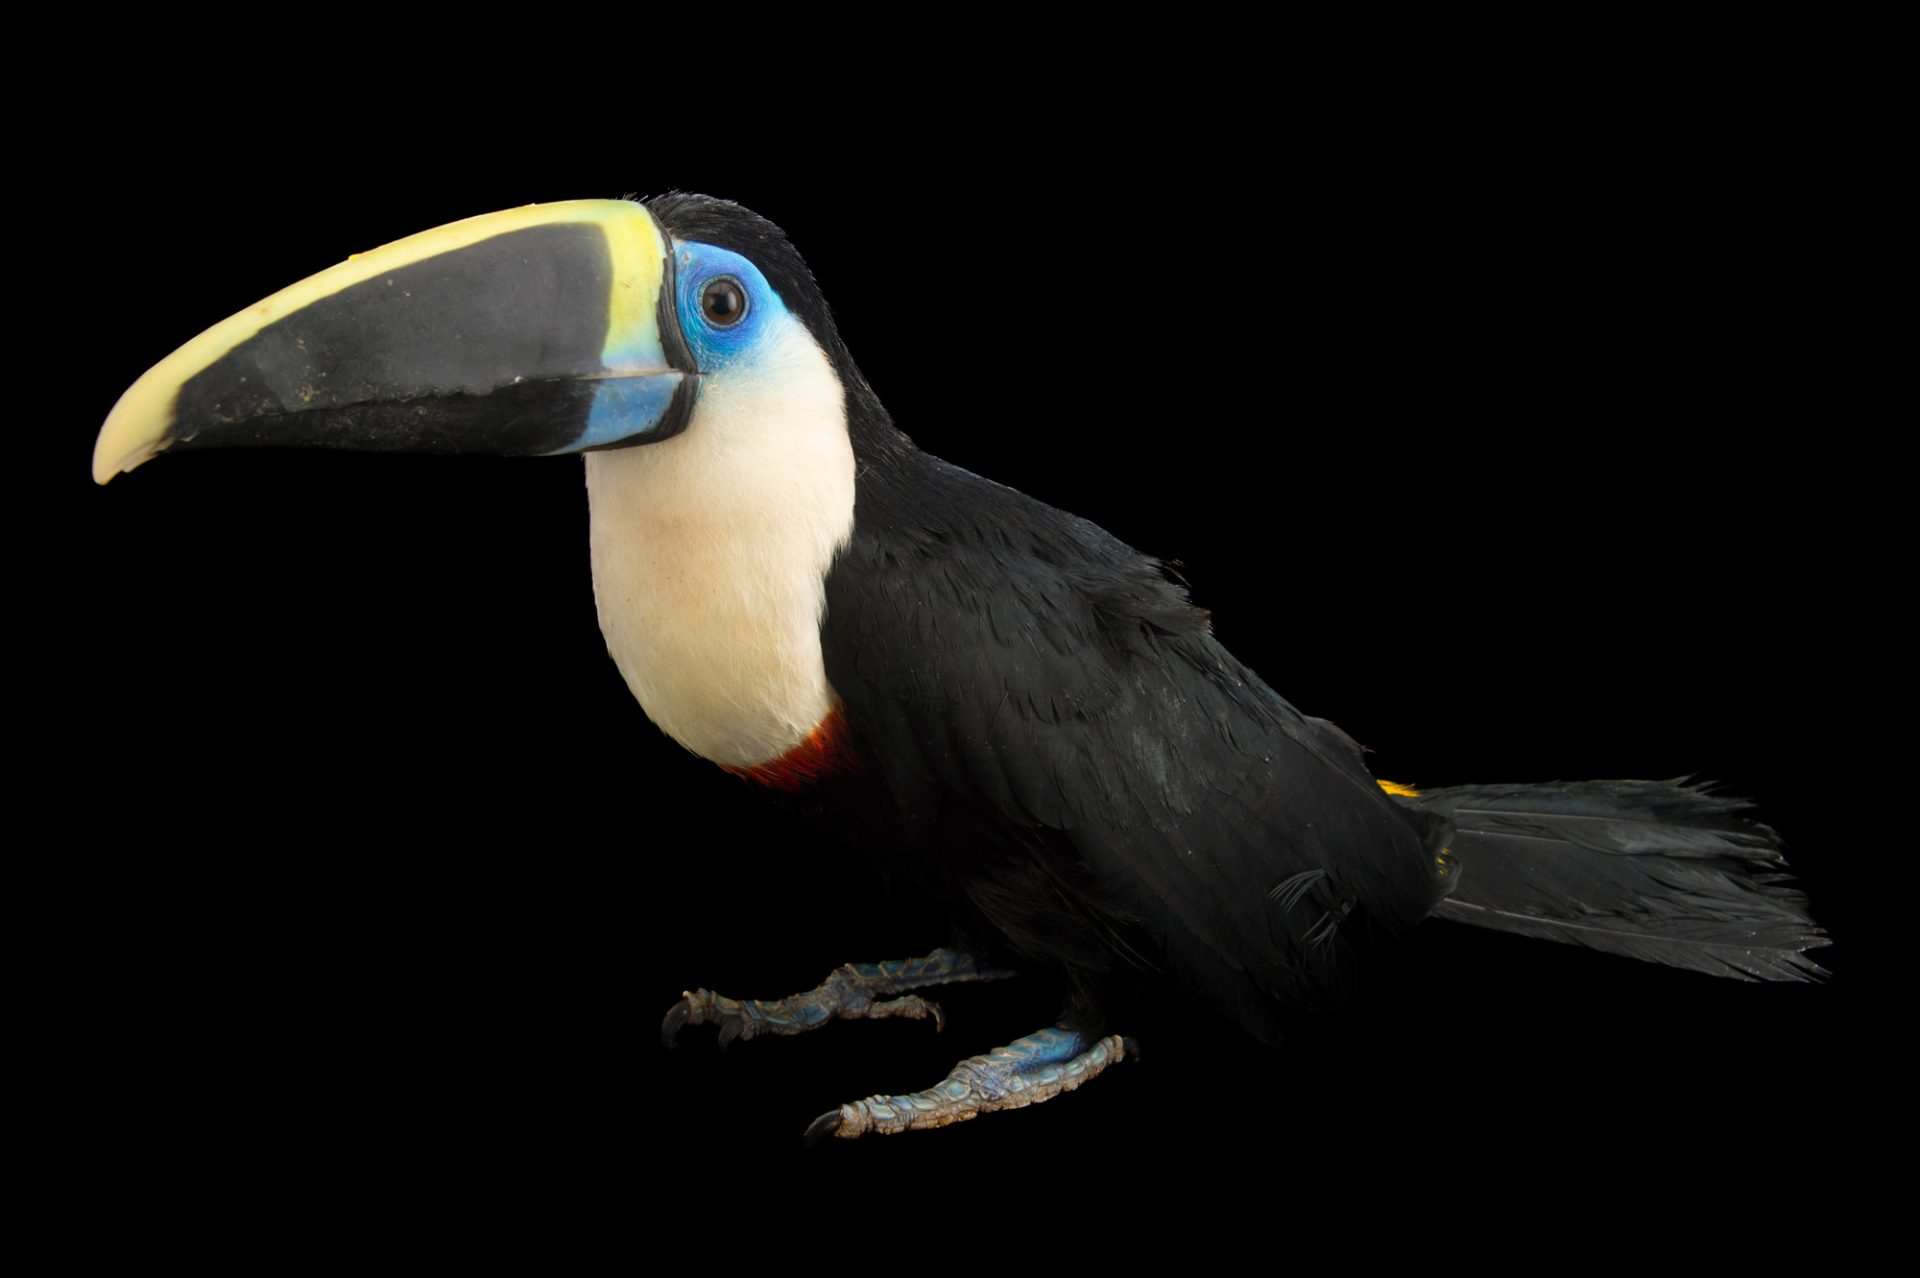 Photo: Yellow-ridged toucan (Ramphastos vitellinus culminatus) at Parque Jaime Duque near Bogota, Colombia.